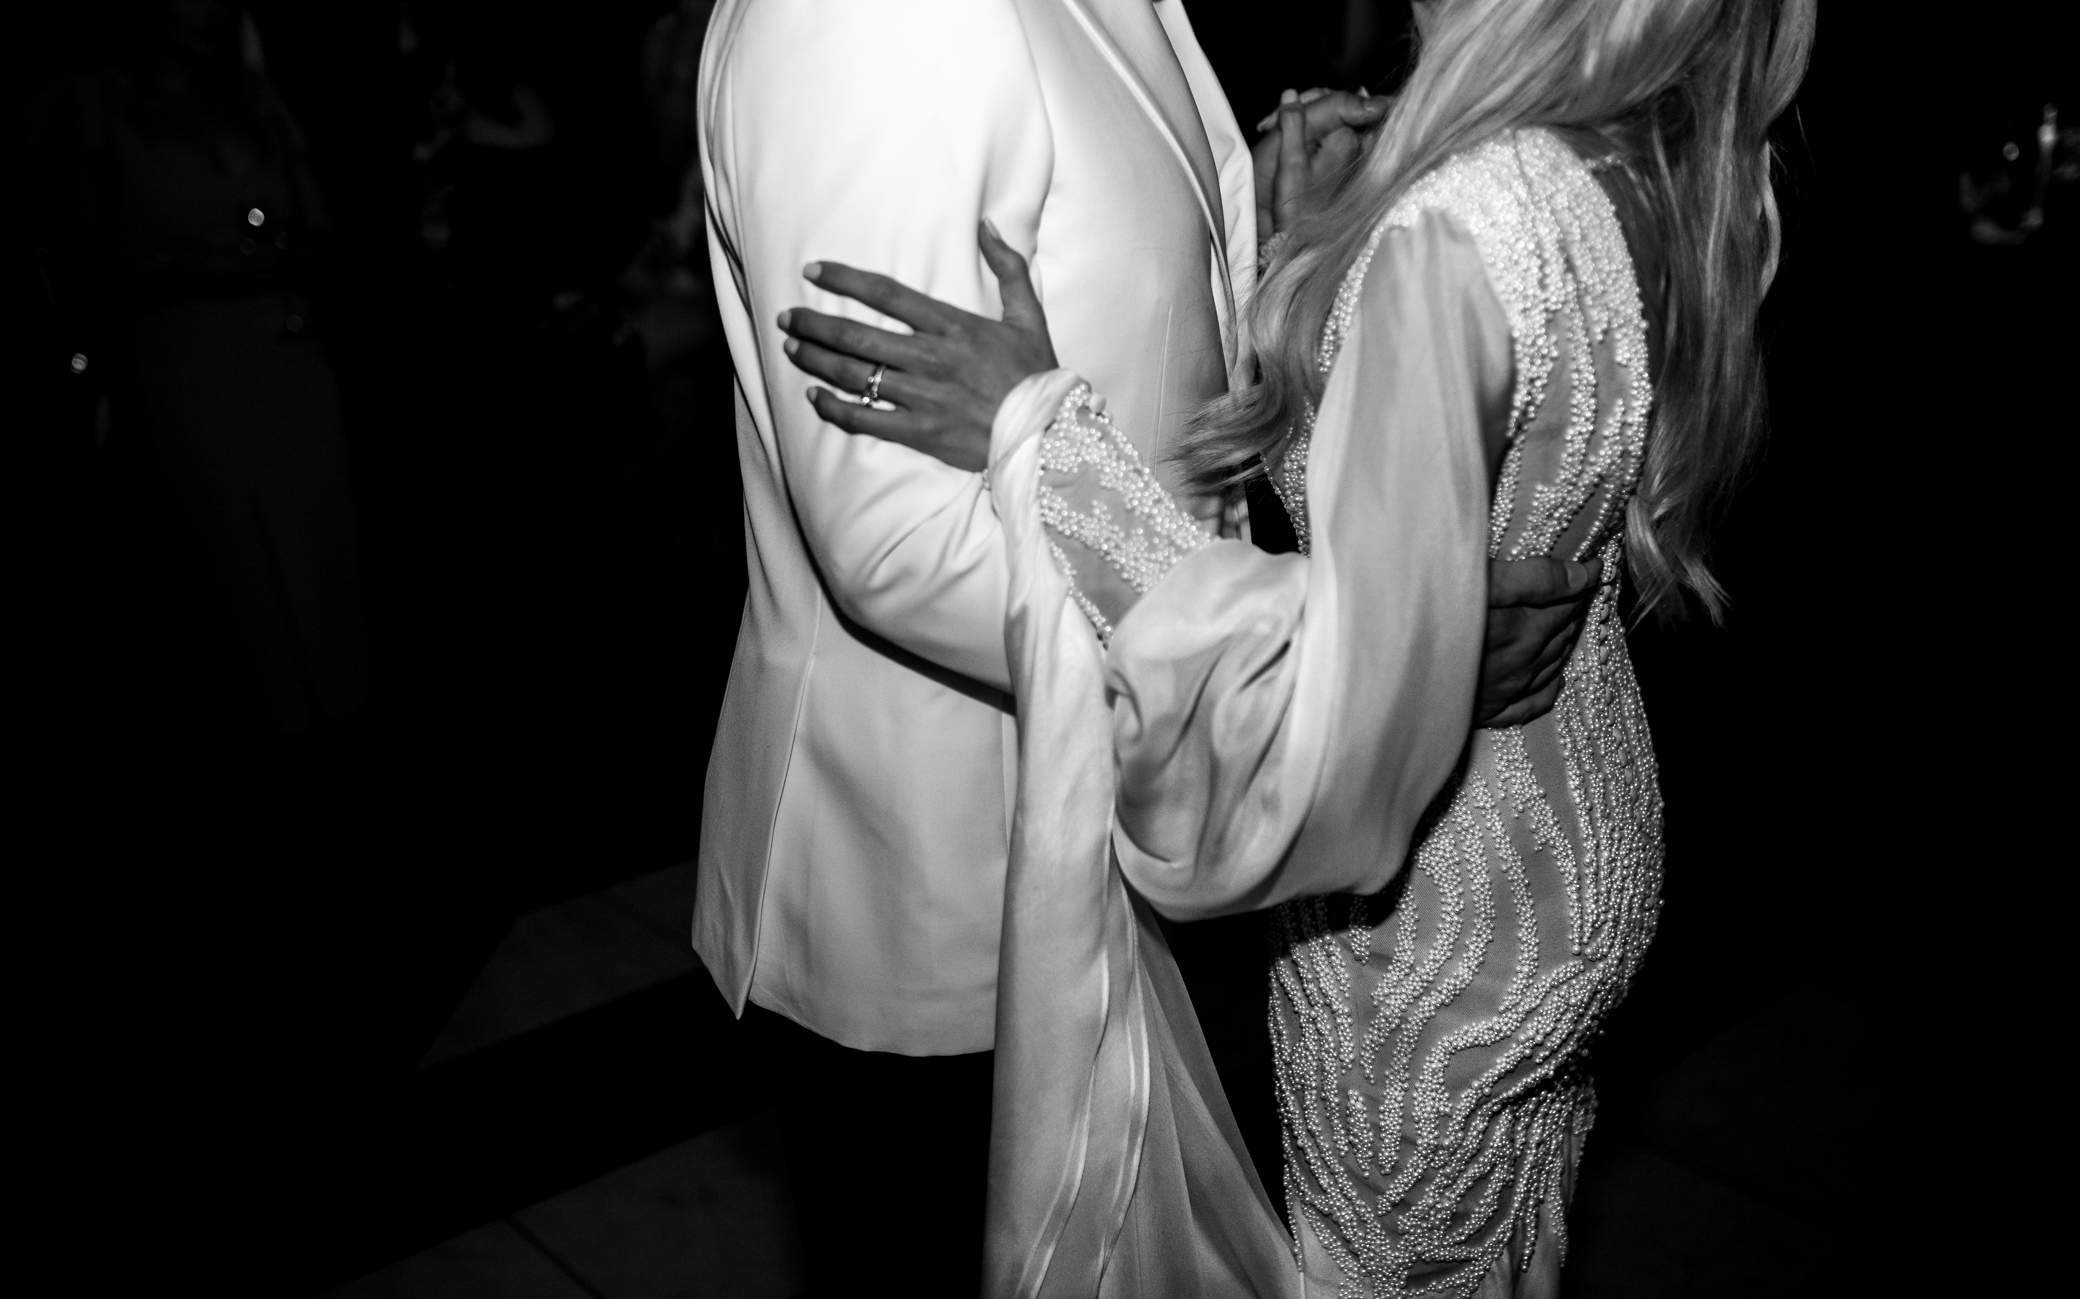 mr-theodore_white-vine-photography_same-sex-wedding-directory17.jpg